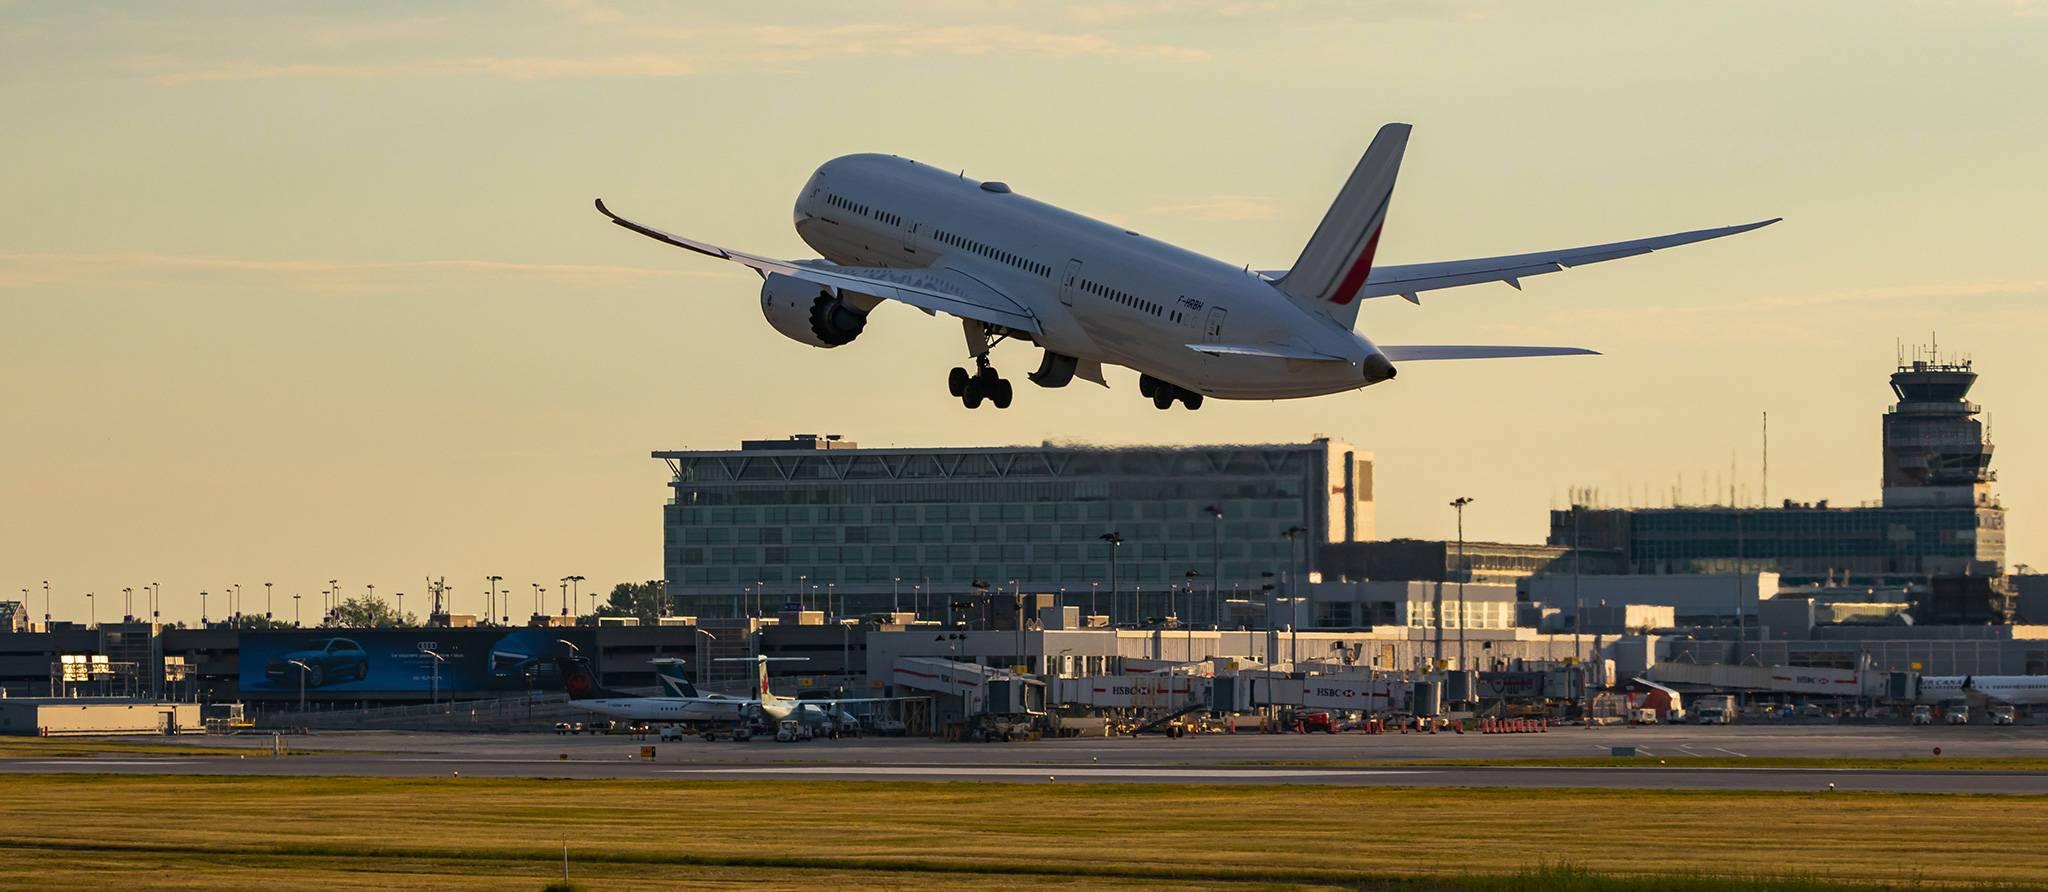 voyage-avion-2